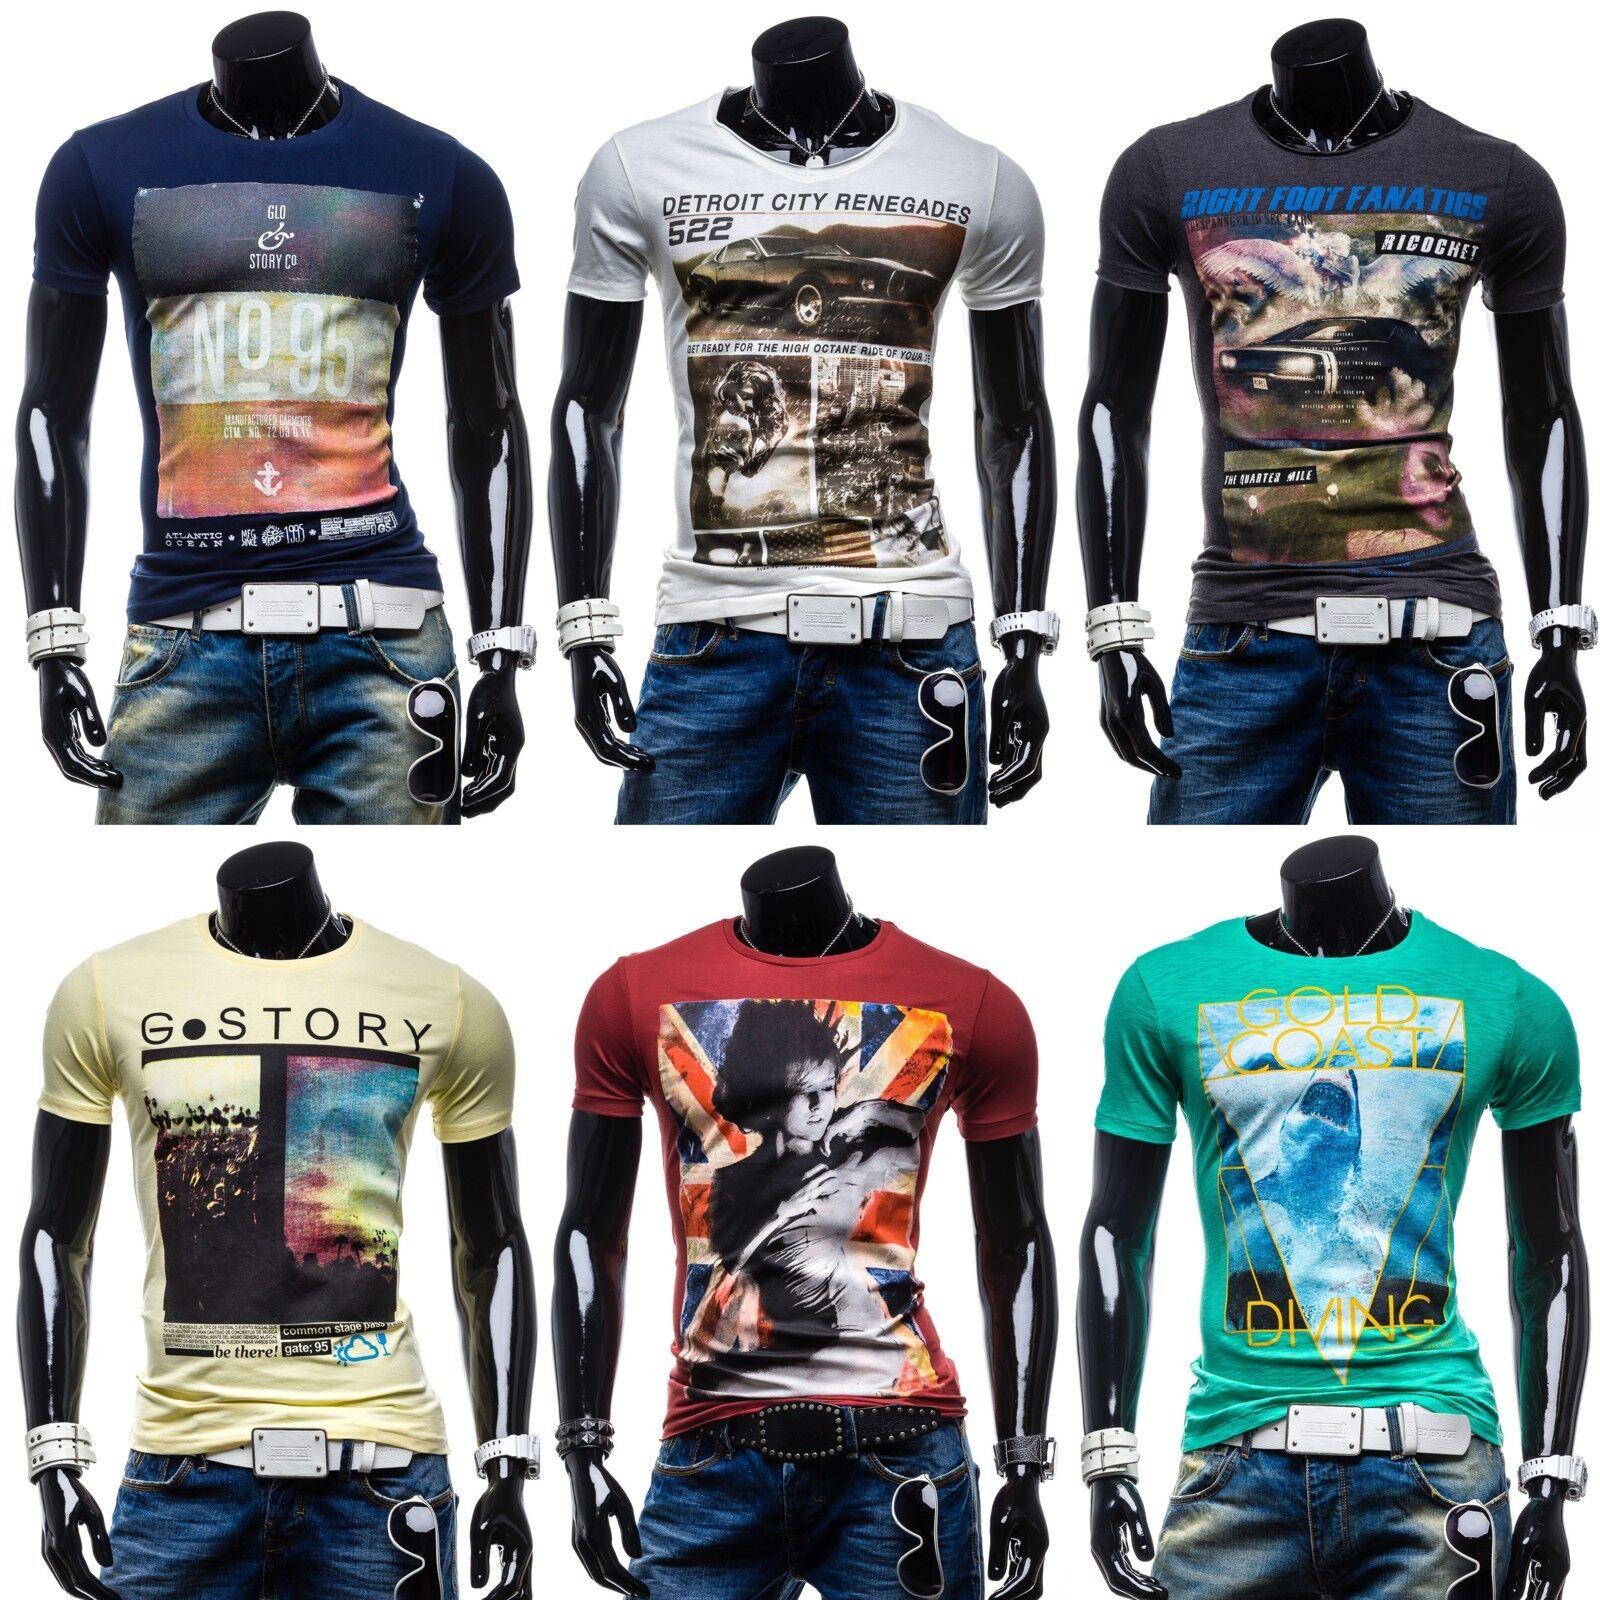 BOLF Glo-Story T-Shirt Kurzarm Shirt Motiv Herren Freizeit Men MIX 3C3 Aufdruck